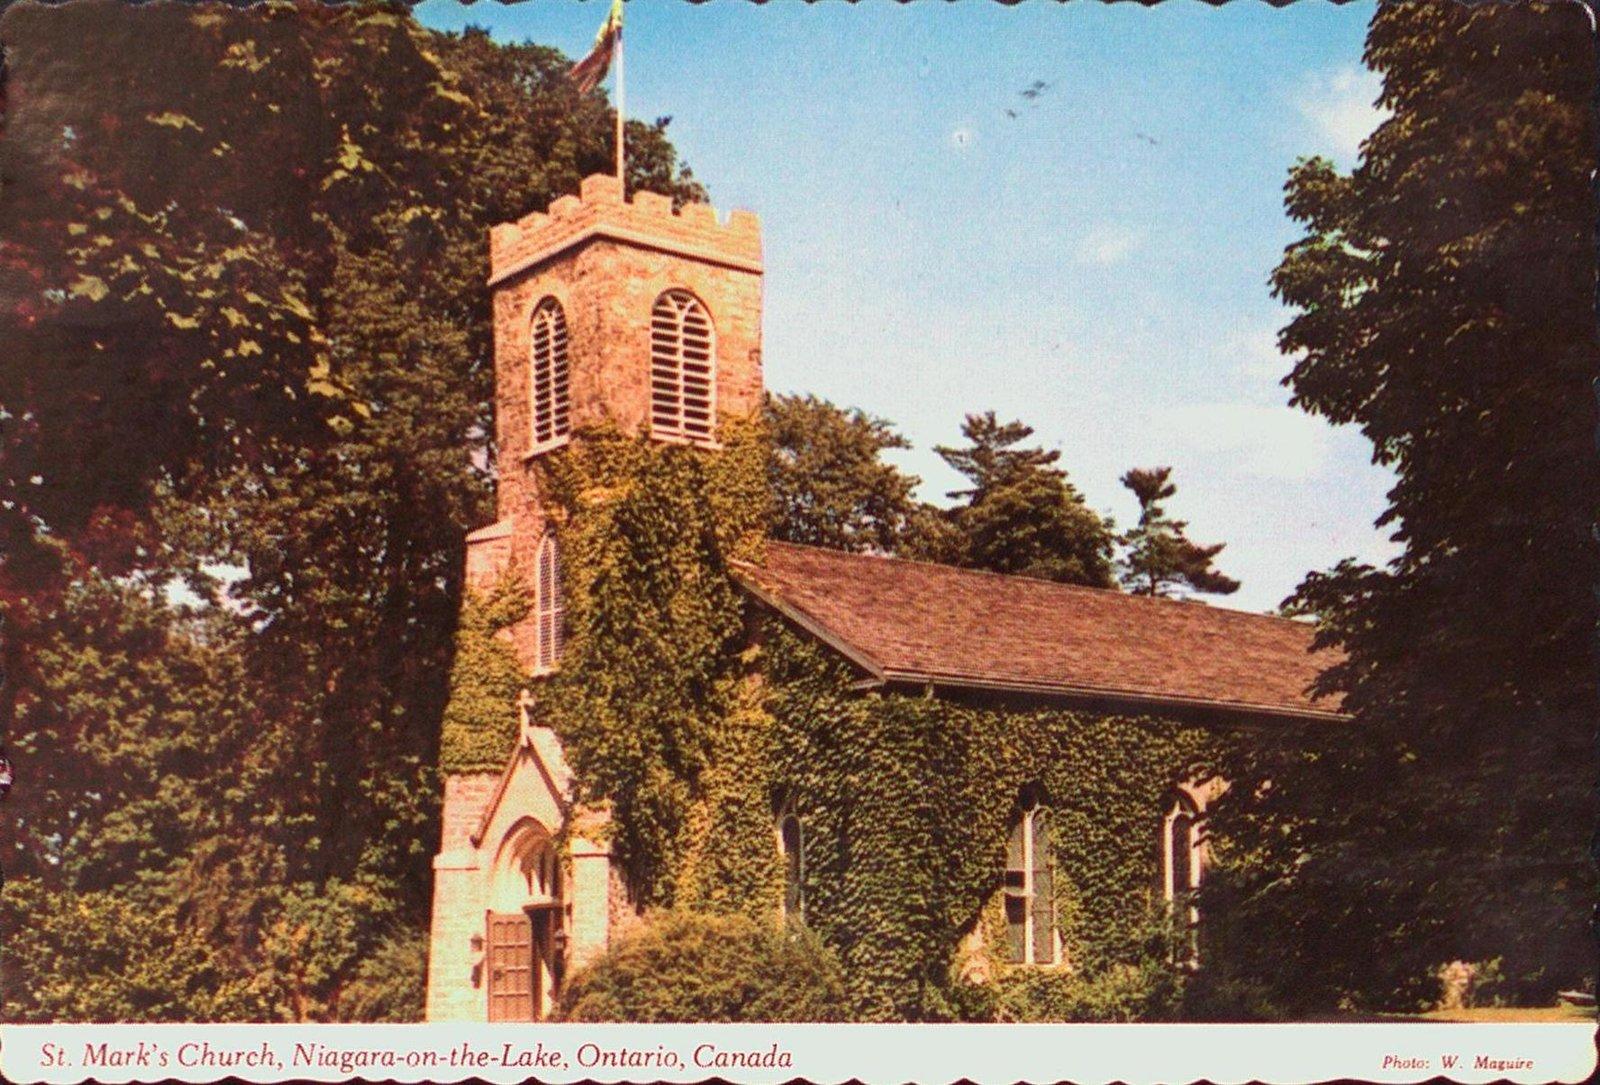 St. Mark's Church, Niagara-on-the-Lake